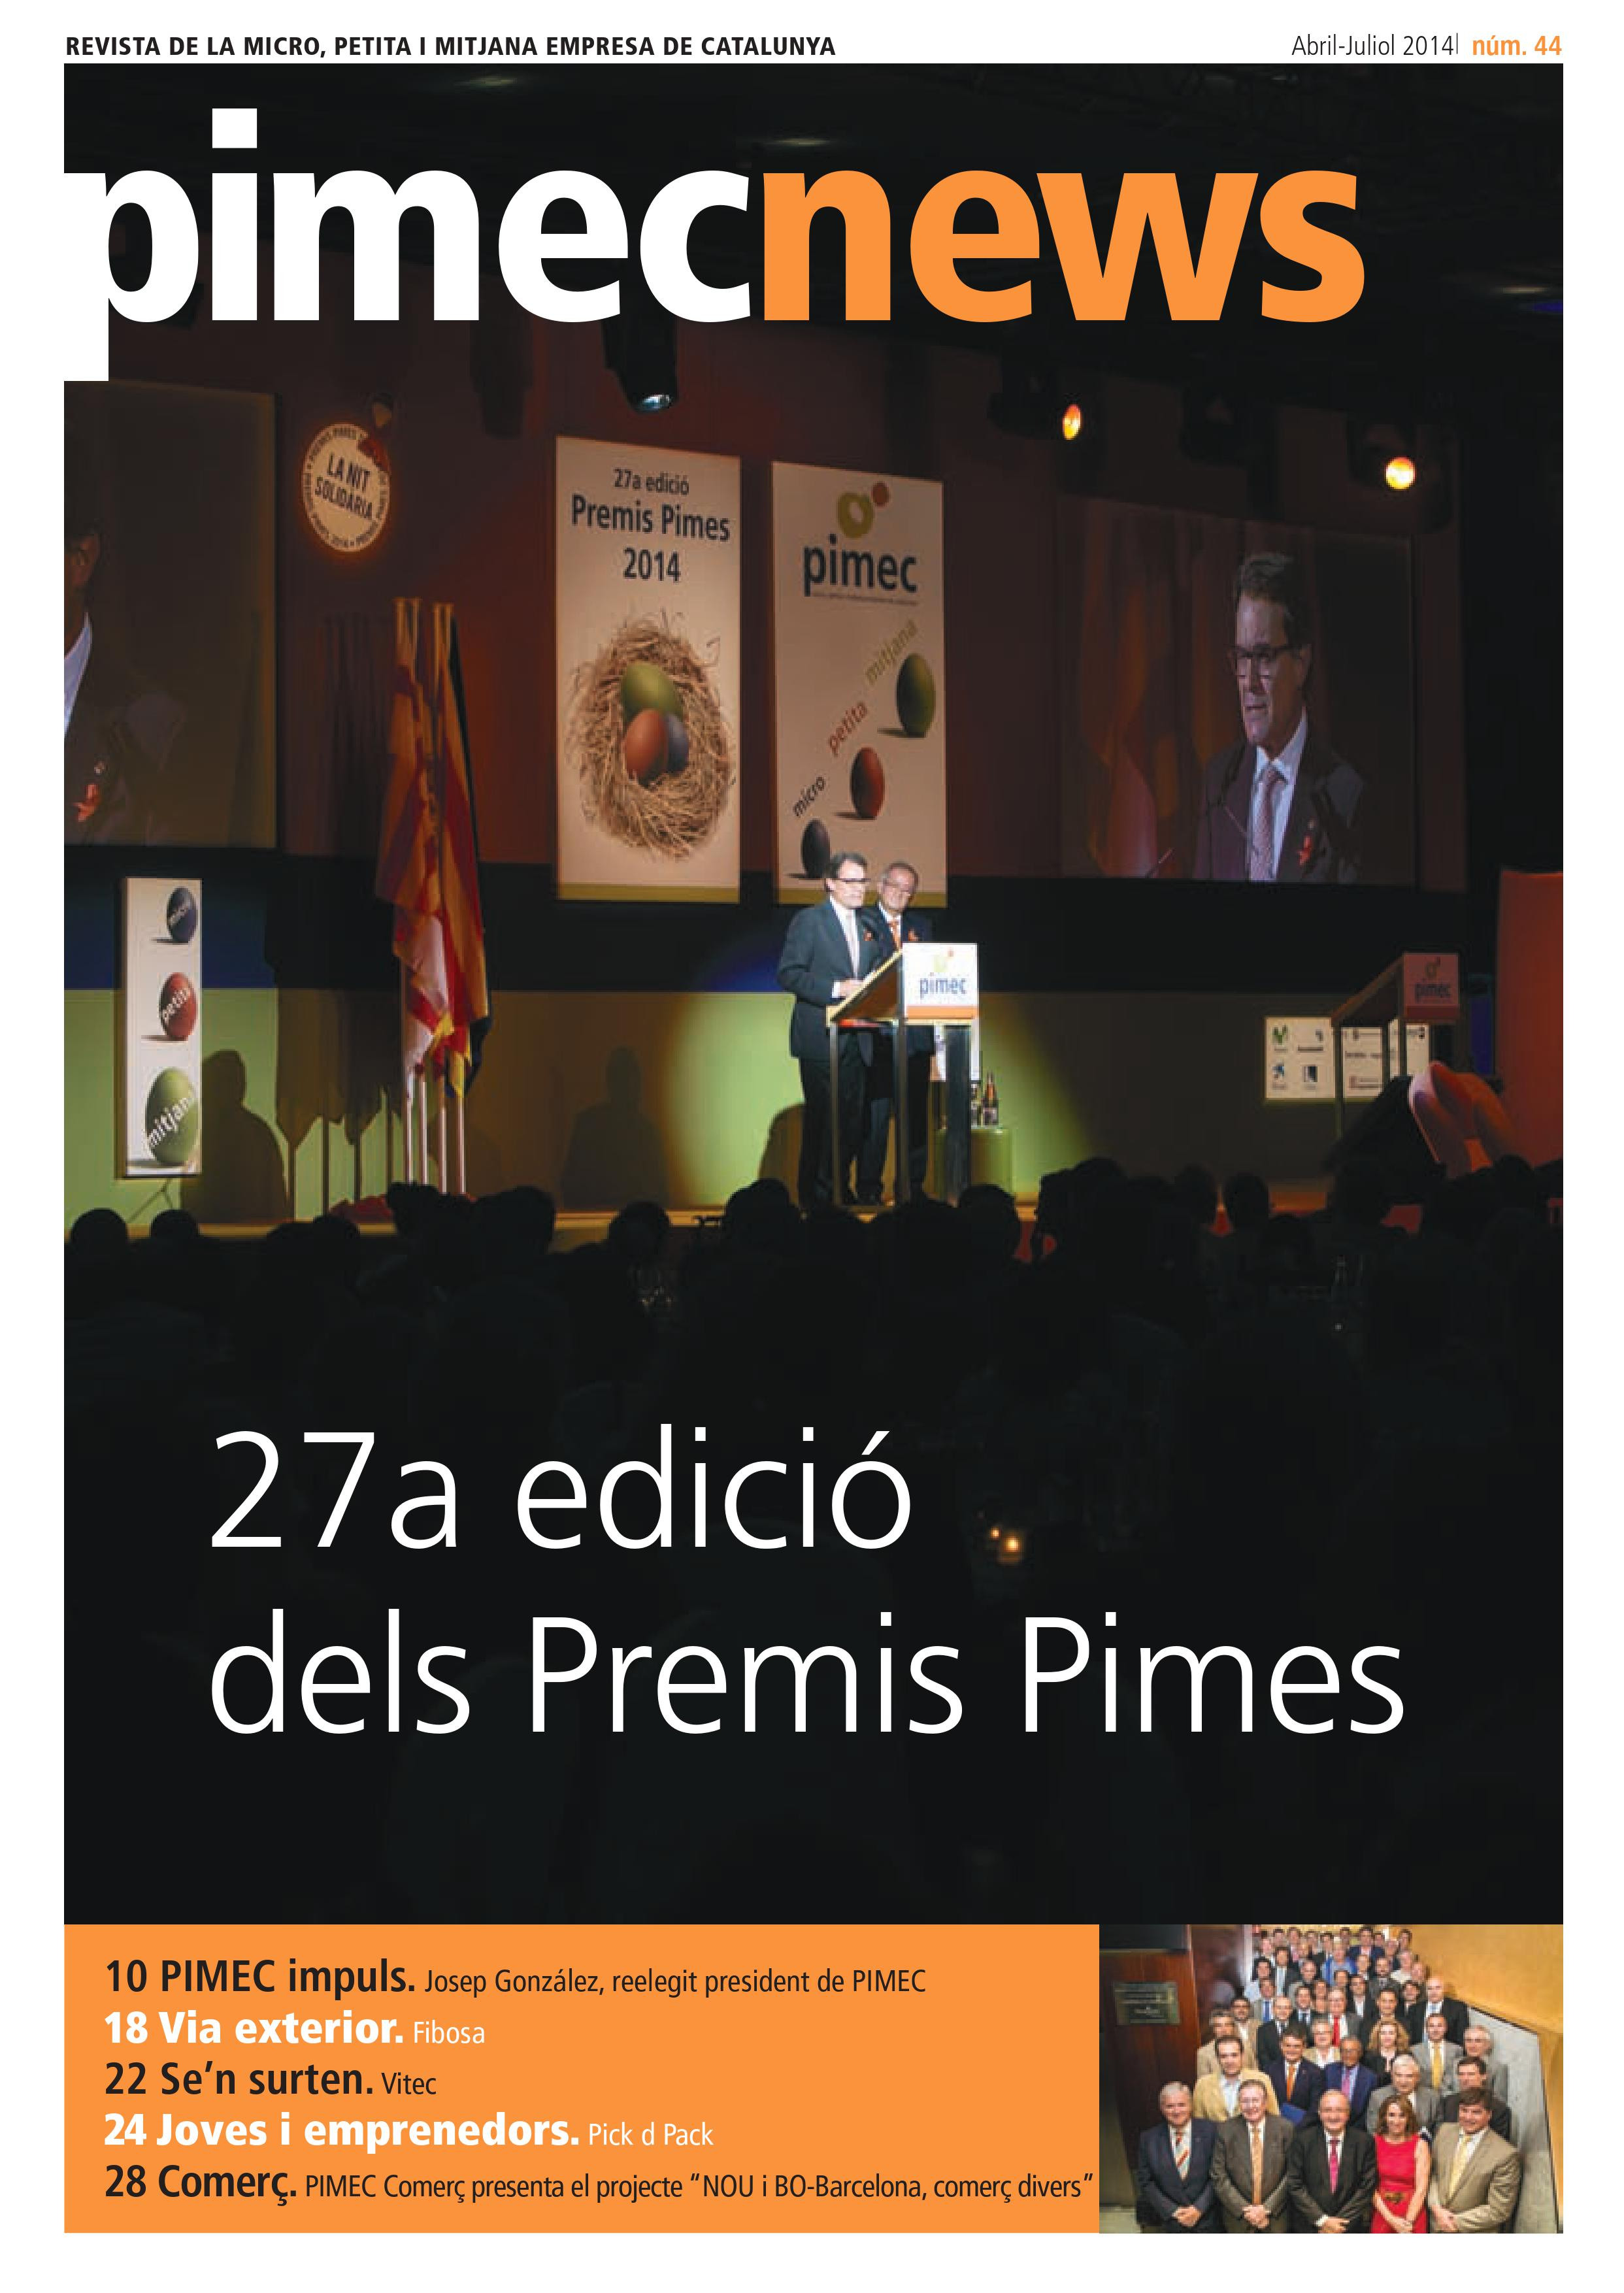 PIMEC News #44